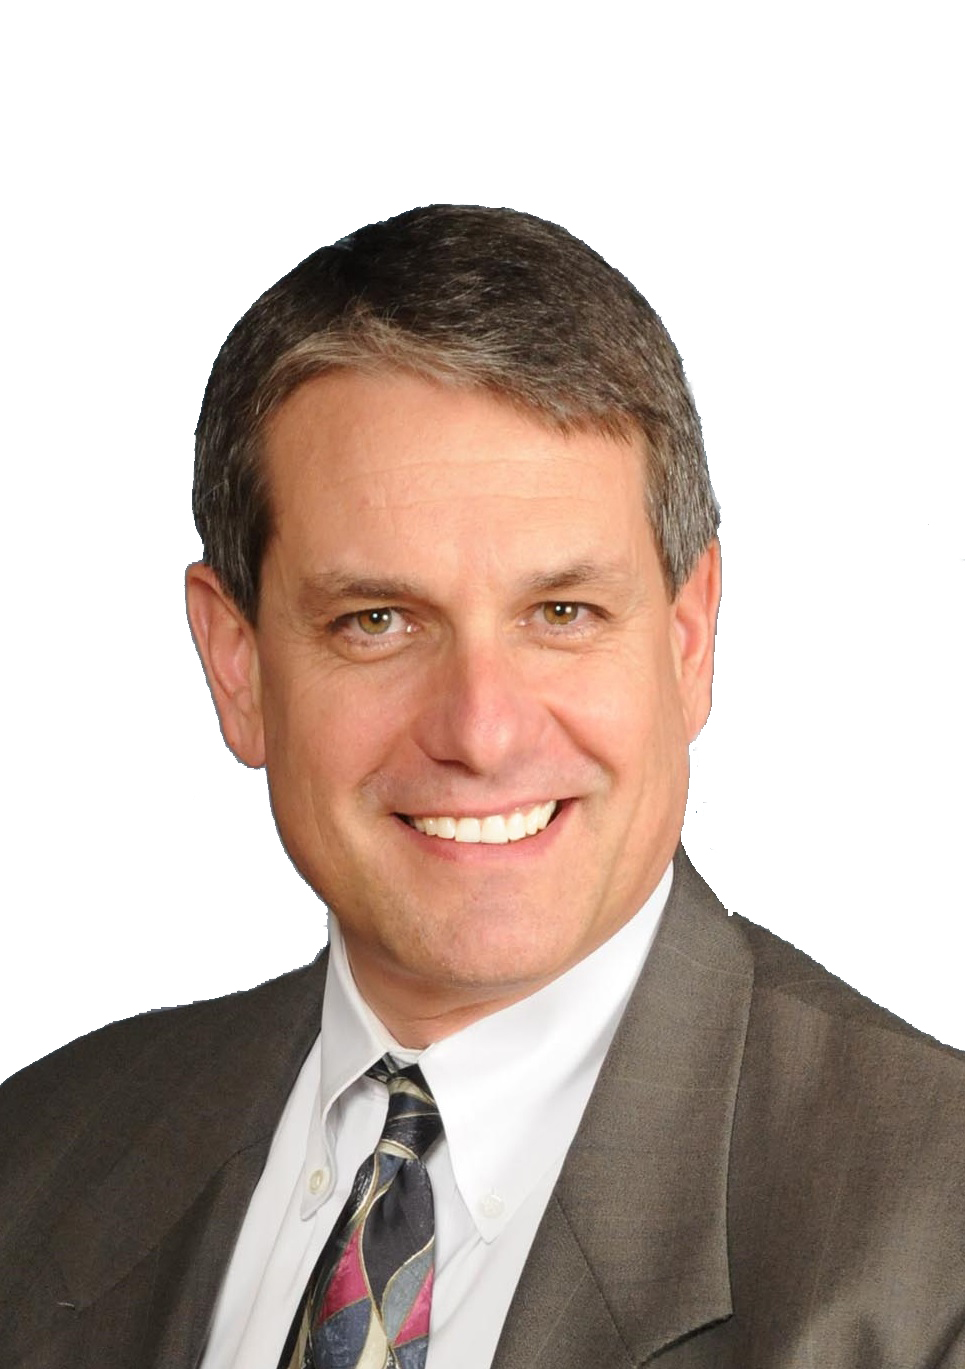 Scott Buscher